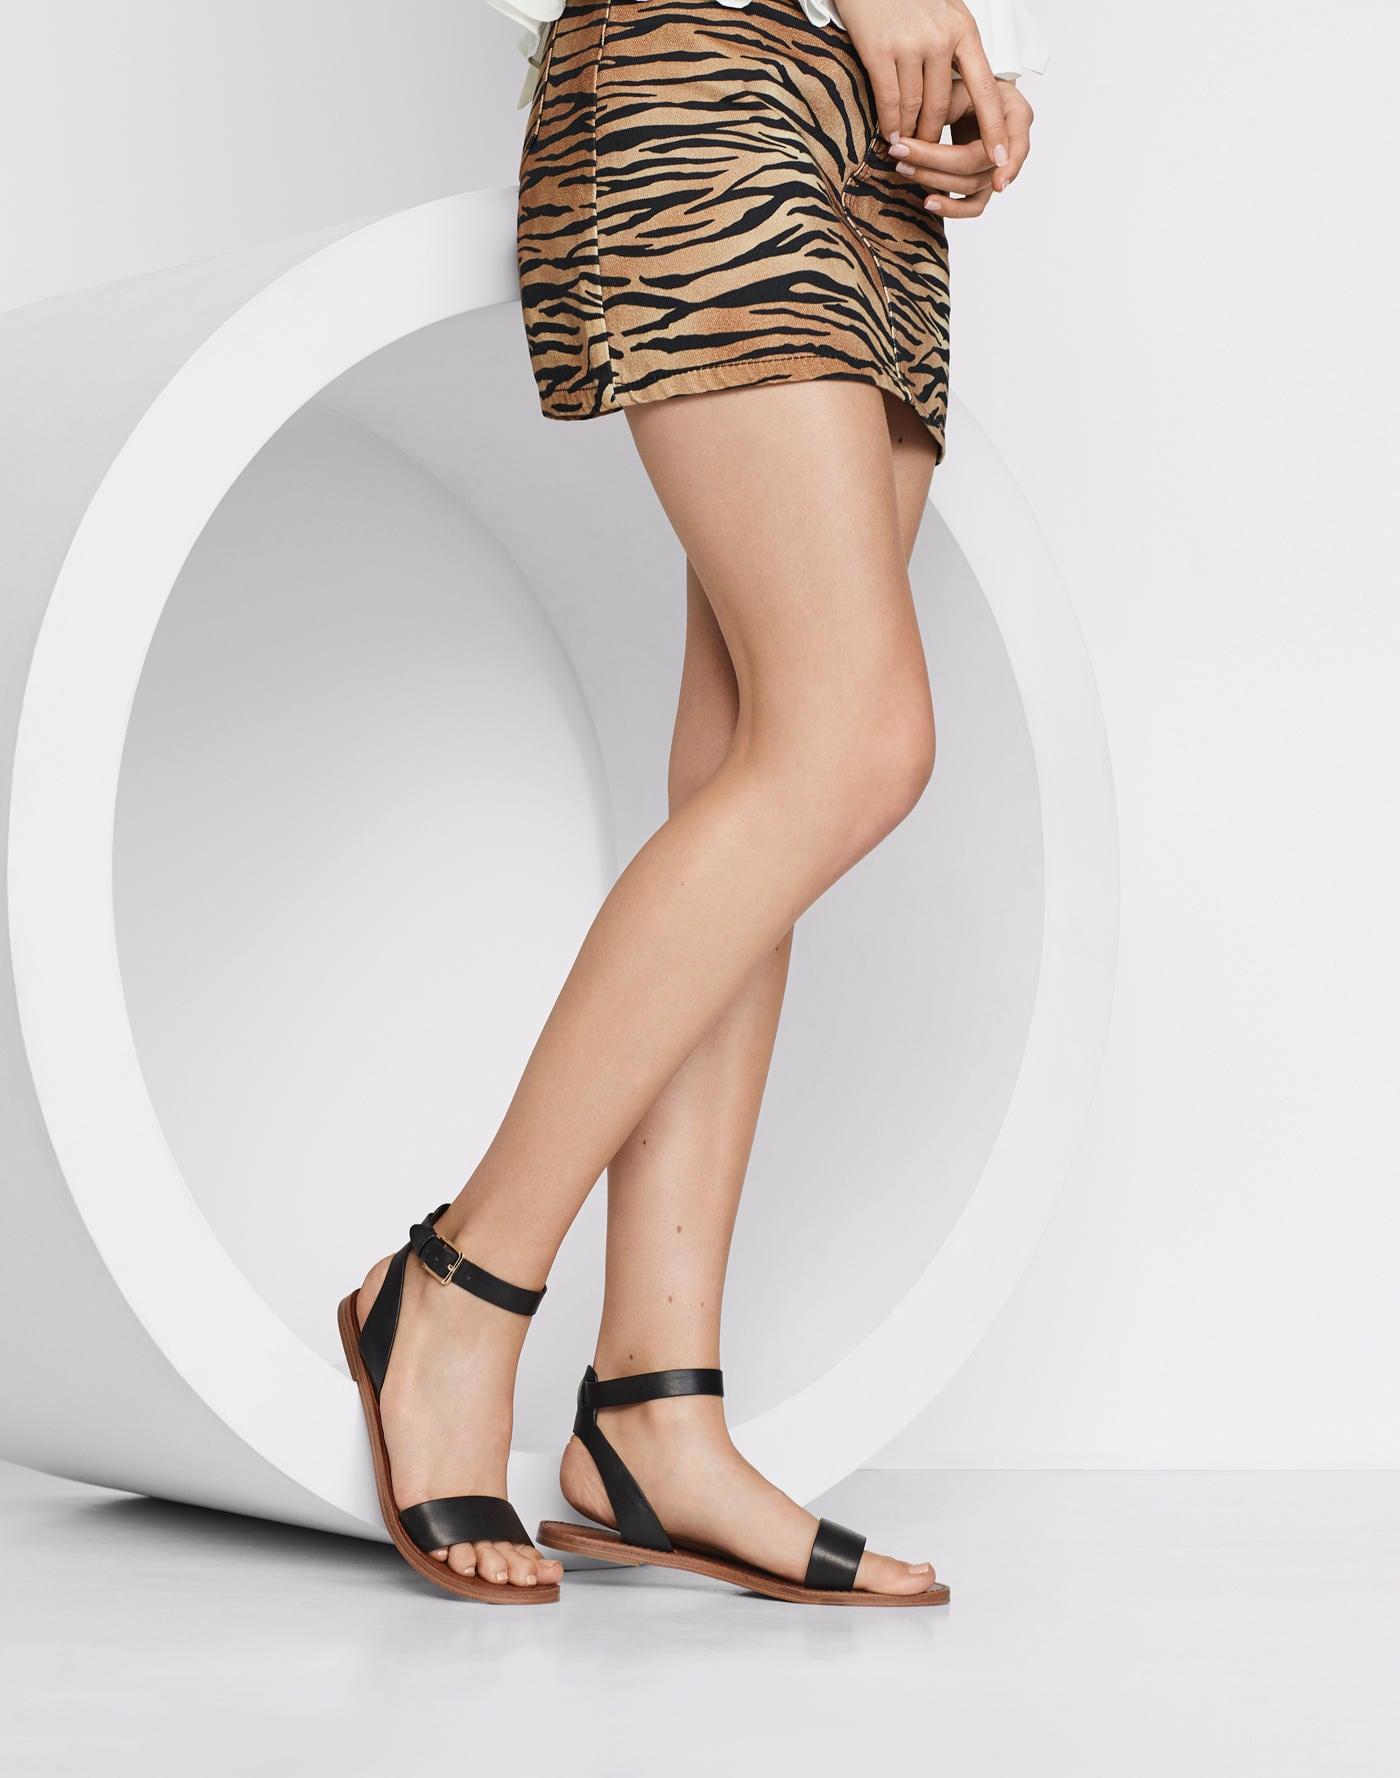 e9492b421c ALDO UK | ALDO Shoes, Boots, Sandals, Handbags & Accessories | ALDO UK